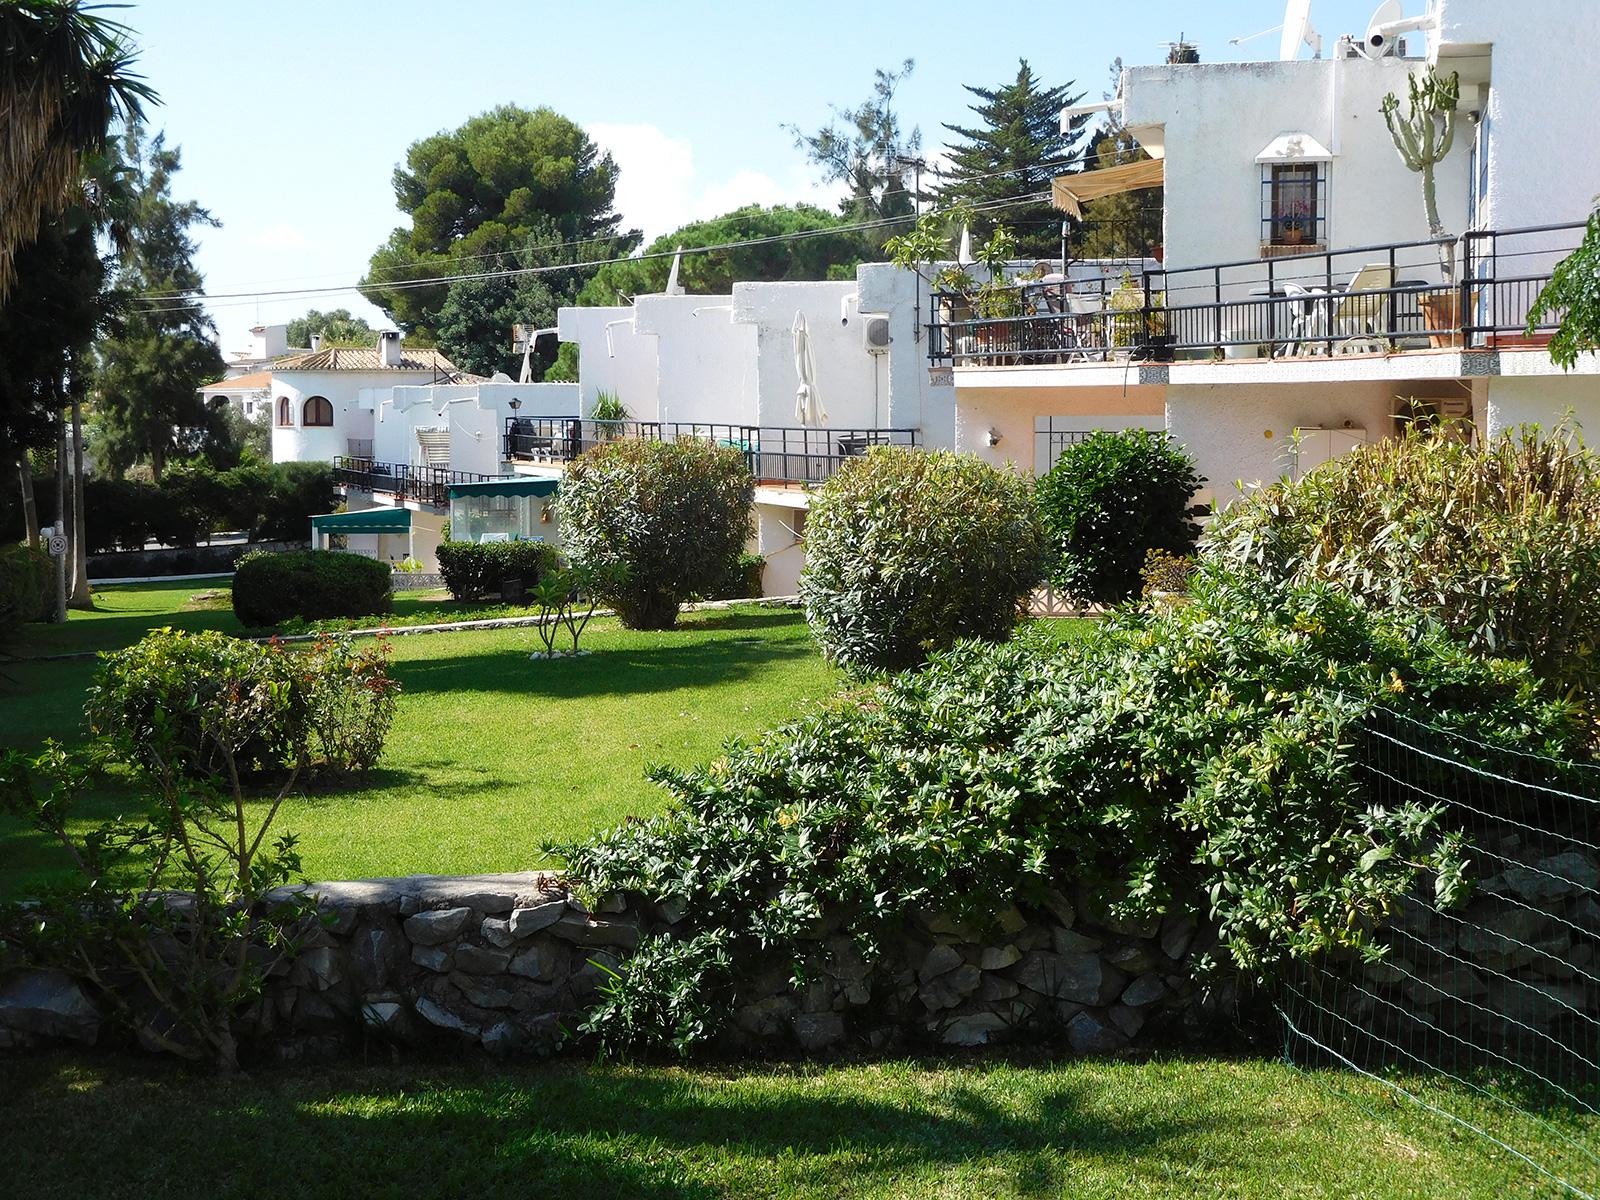 The lush garden complex